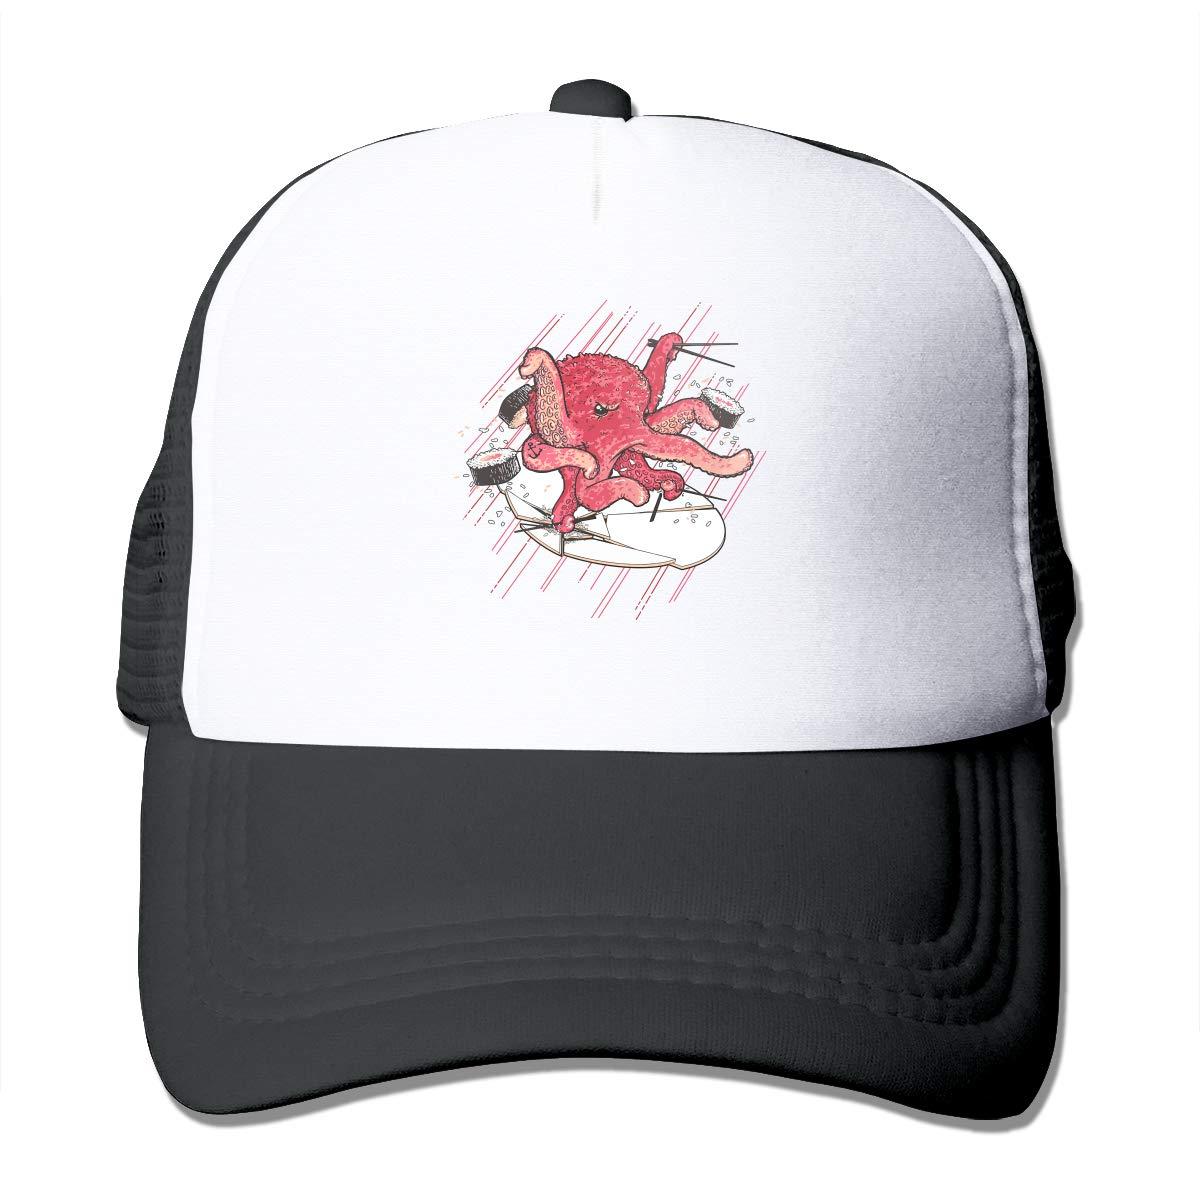 8e1da9ce0d641 Nacho Sushi Trucker Hat Snap Back Sun Mesh Baseball Cap Hip Hop Flat Hats  for Men and Women Black at Amazon Men s Clothing store